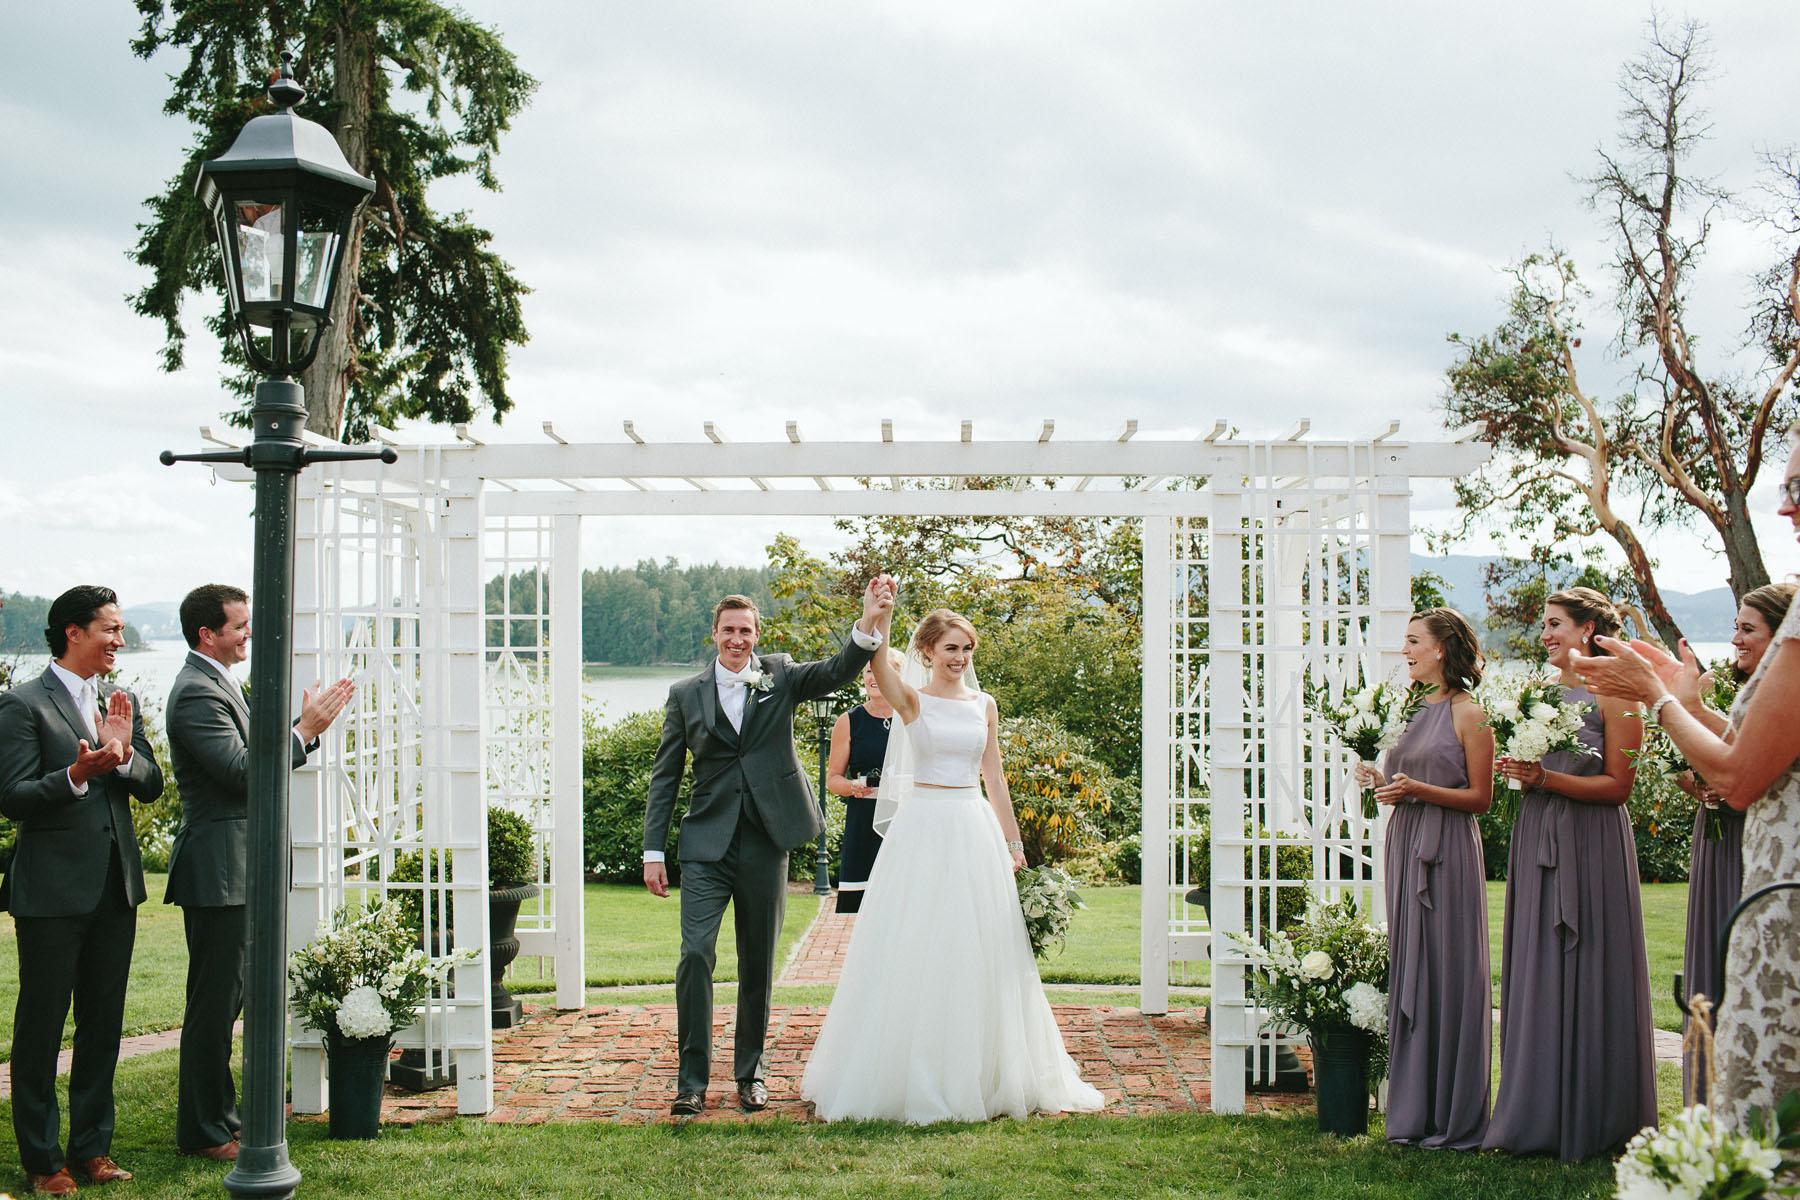 thetis-island-wedding-photographer-rp-rn-098.jpg